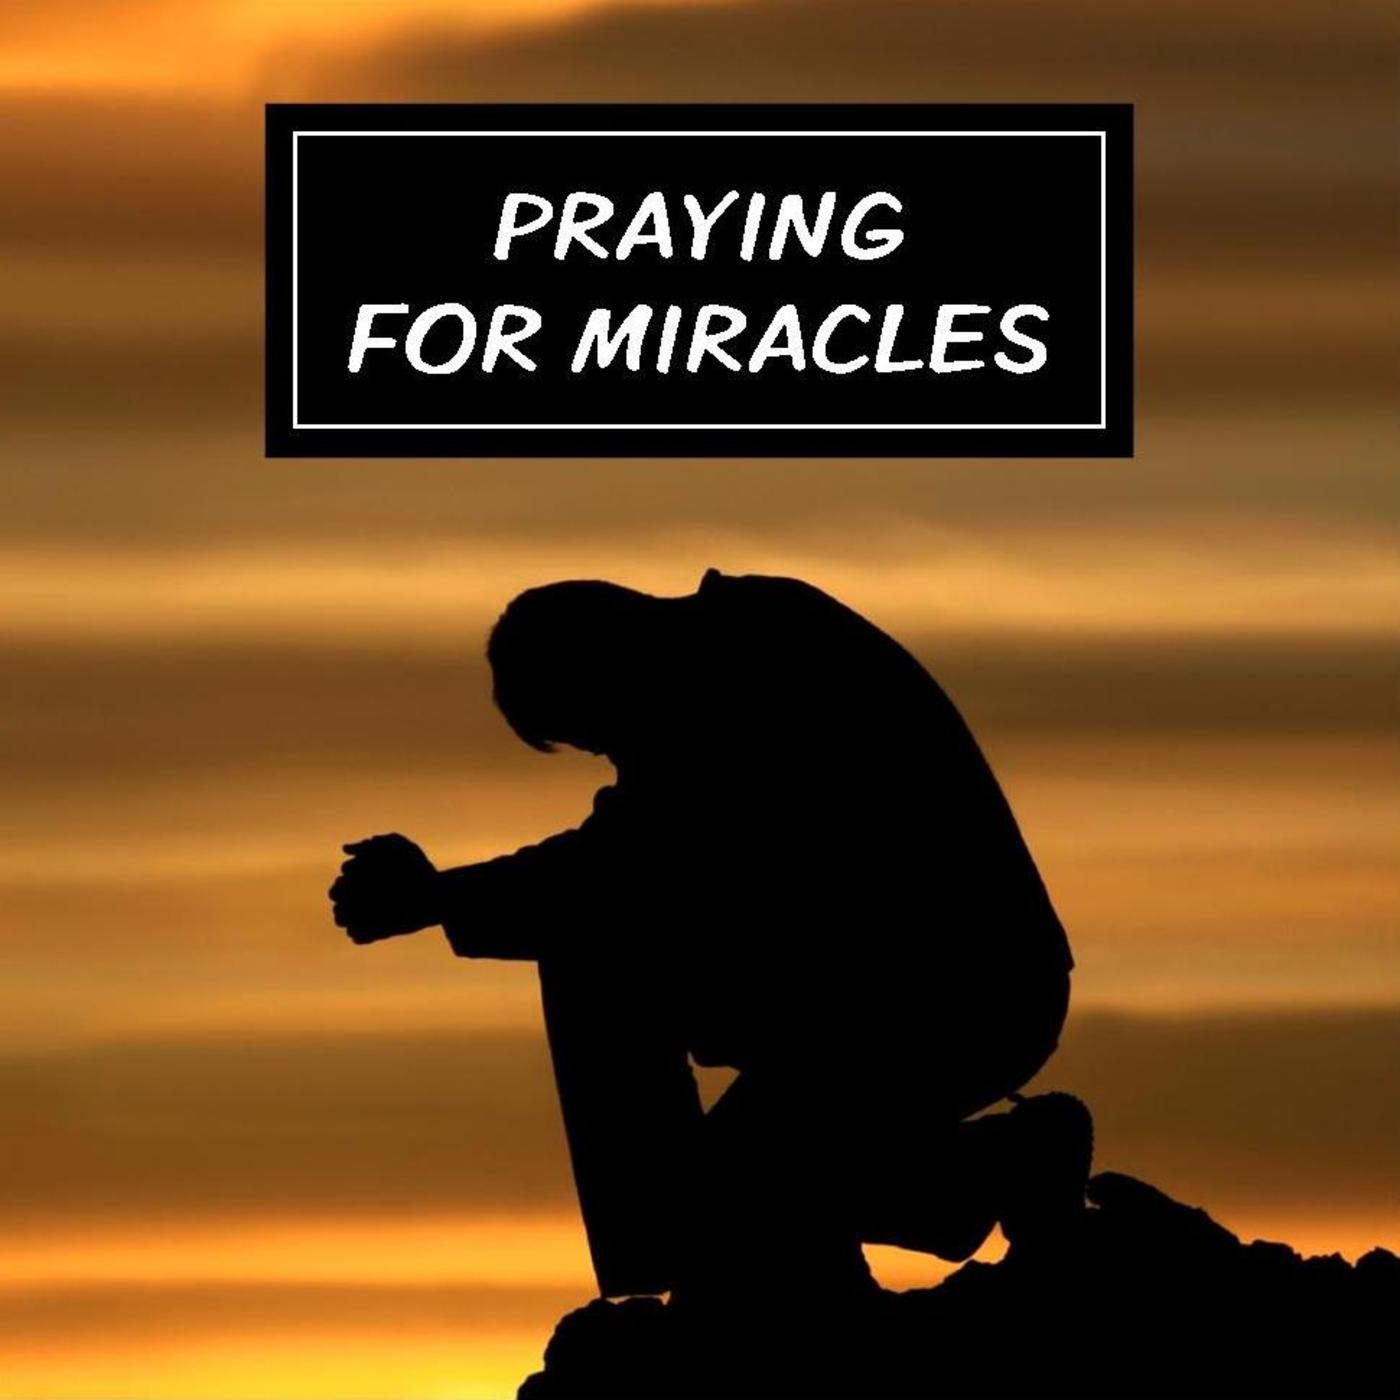 PRAYING FOR MIRACLES